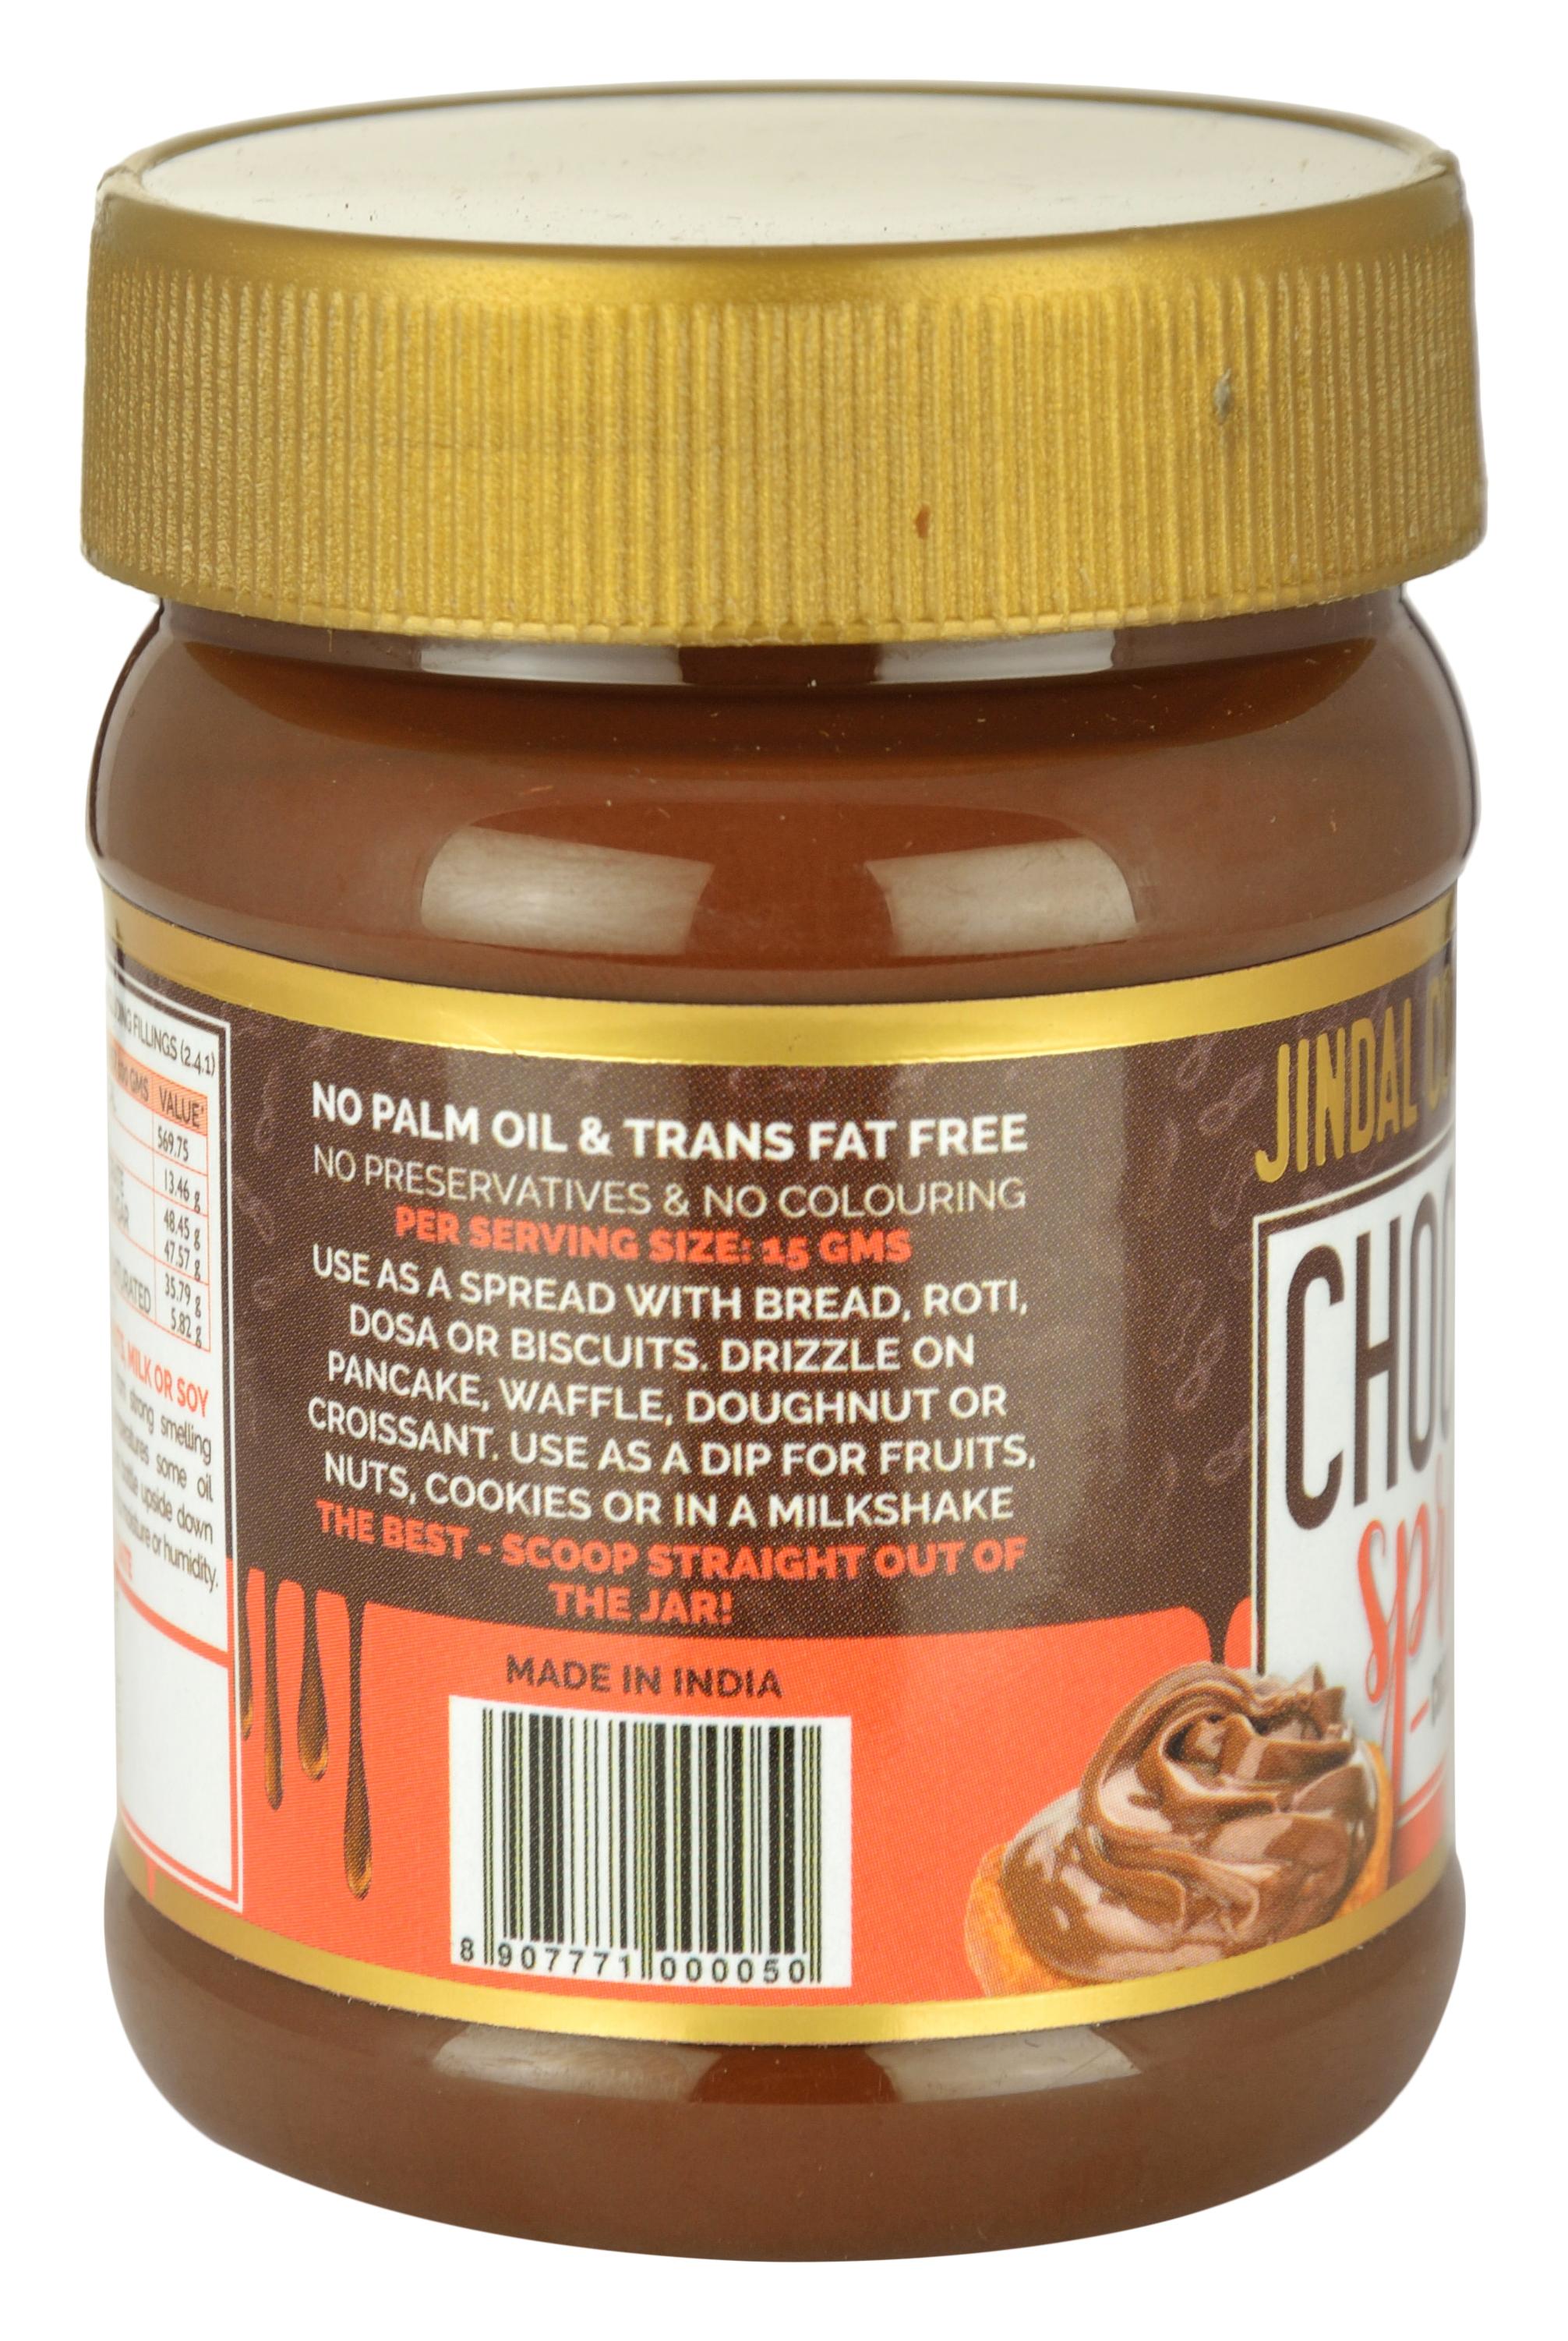 Chocolate-Spreads-Cocoa-Hazelnut-Cream160_4